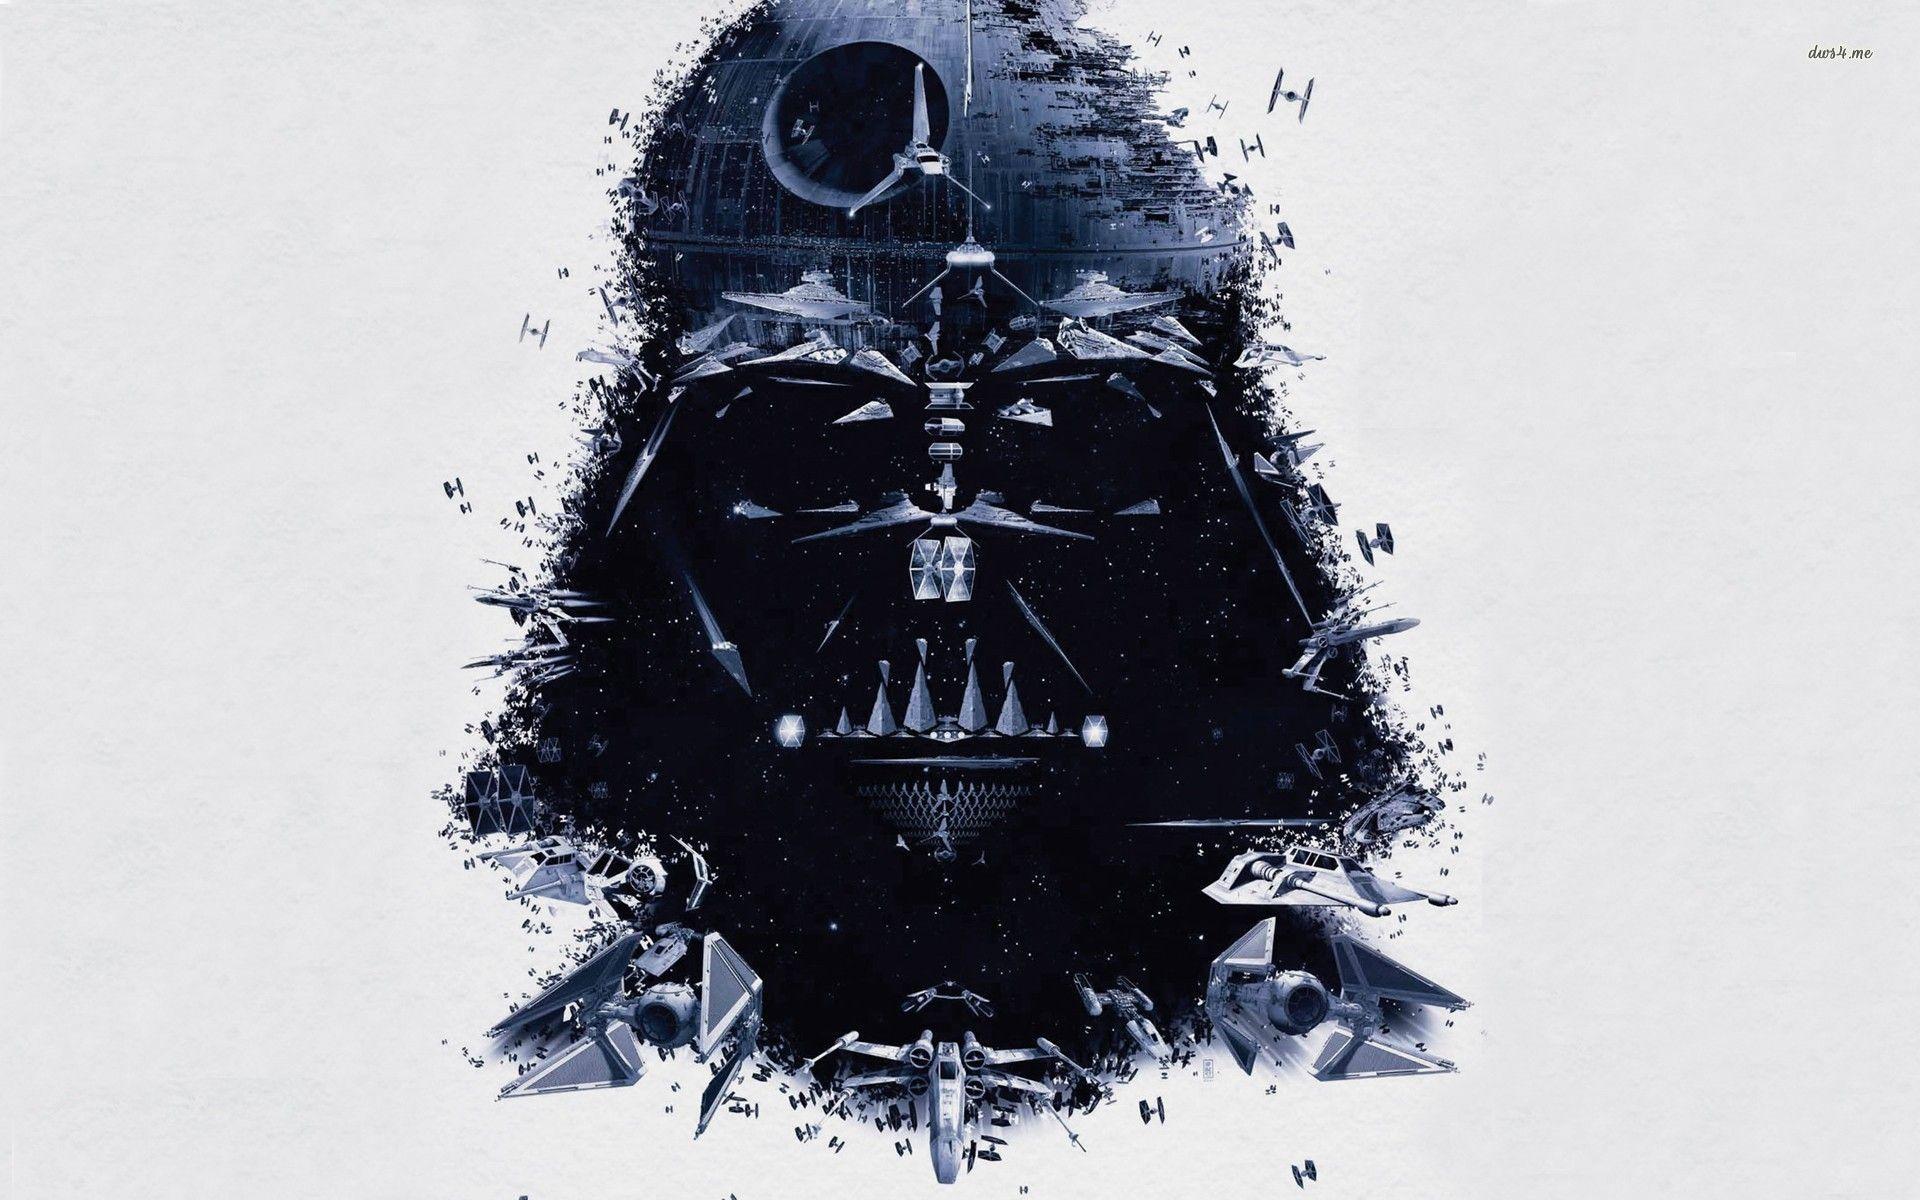 Darth Vader Hd Wallpaper Google Kereses With Images Star Wars Wallpaper Star Wars Illustration Star Wars Art